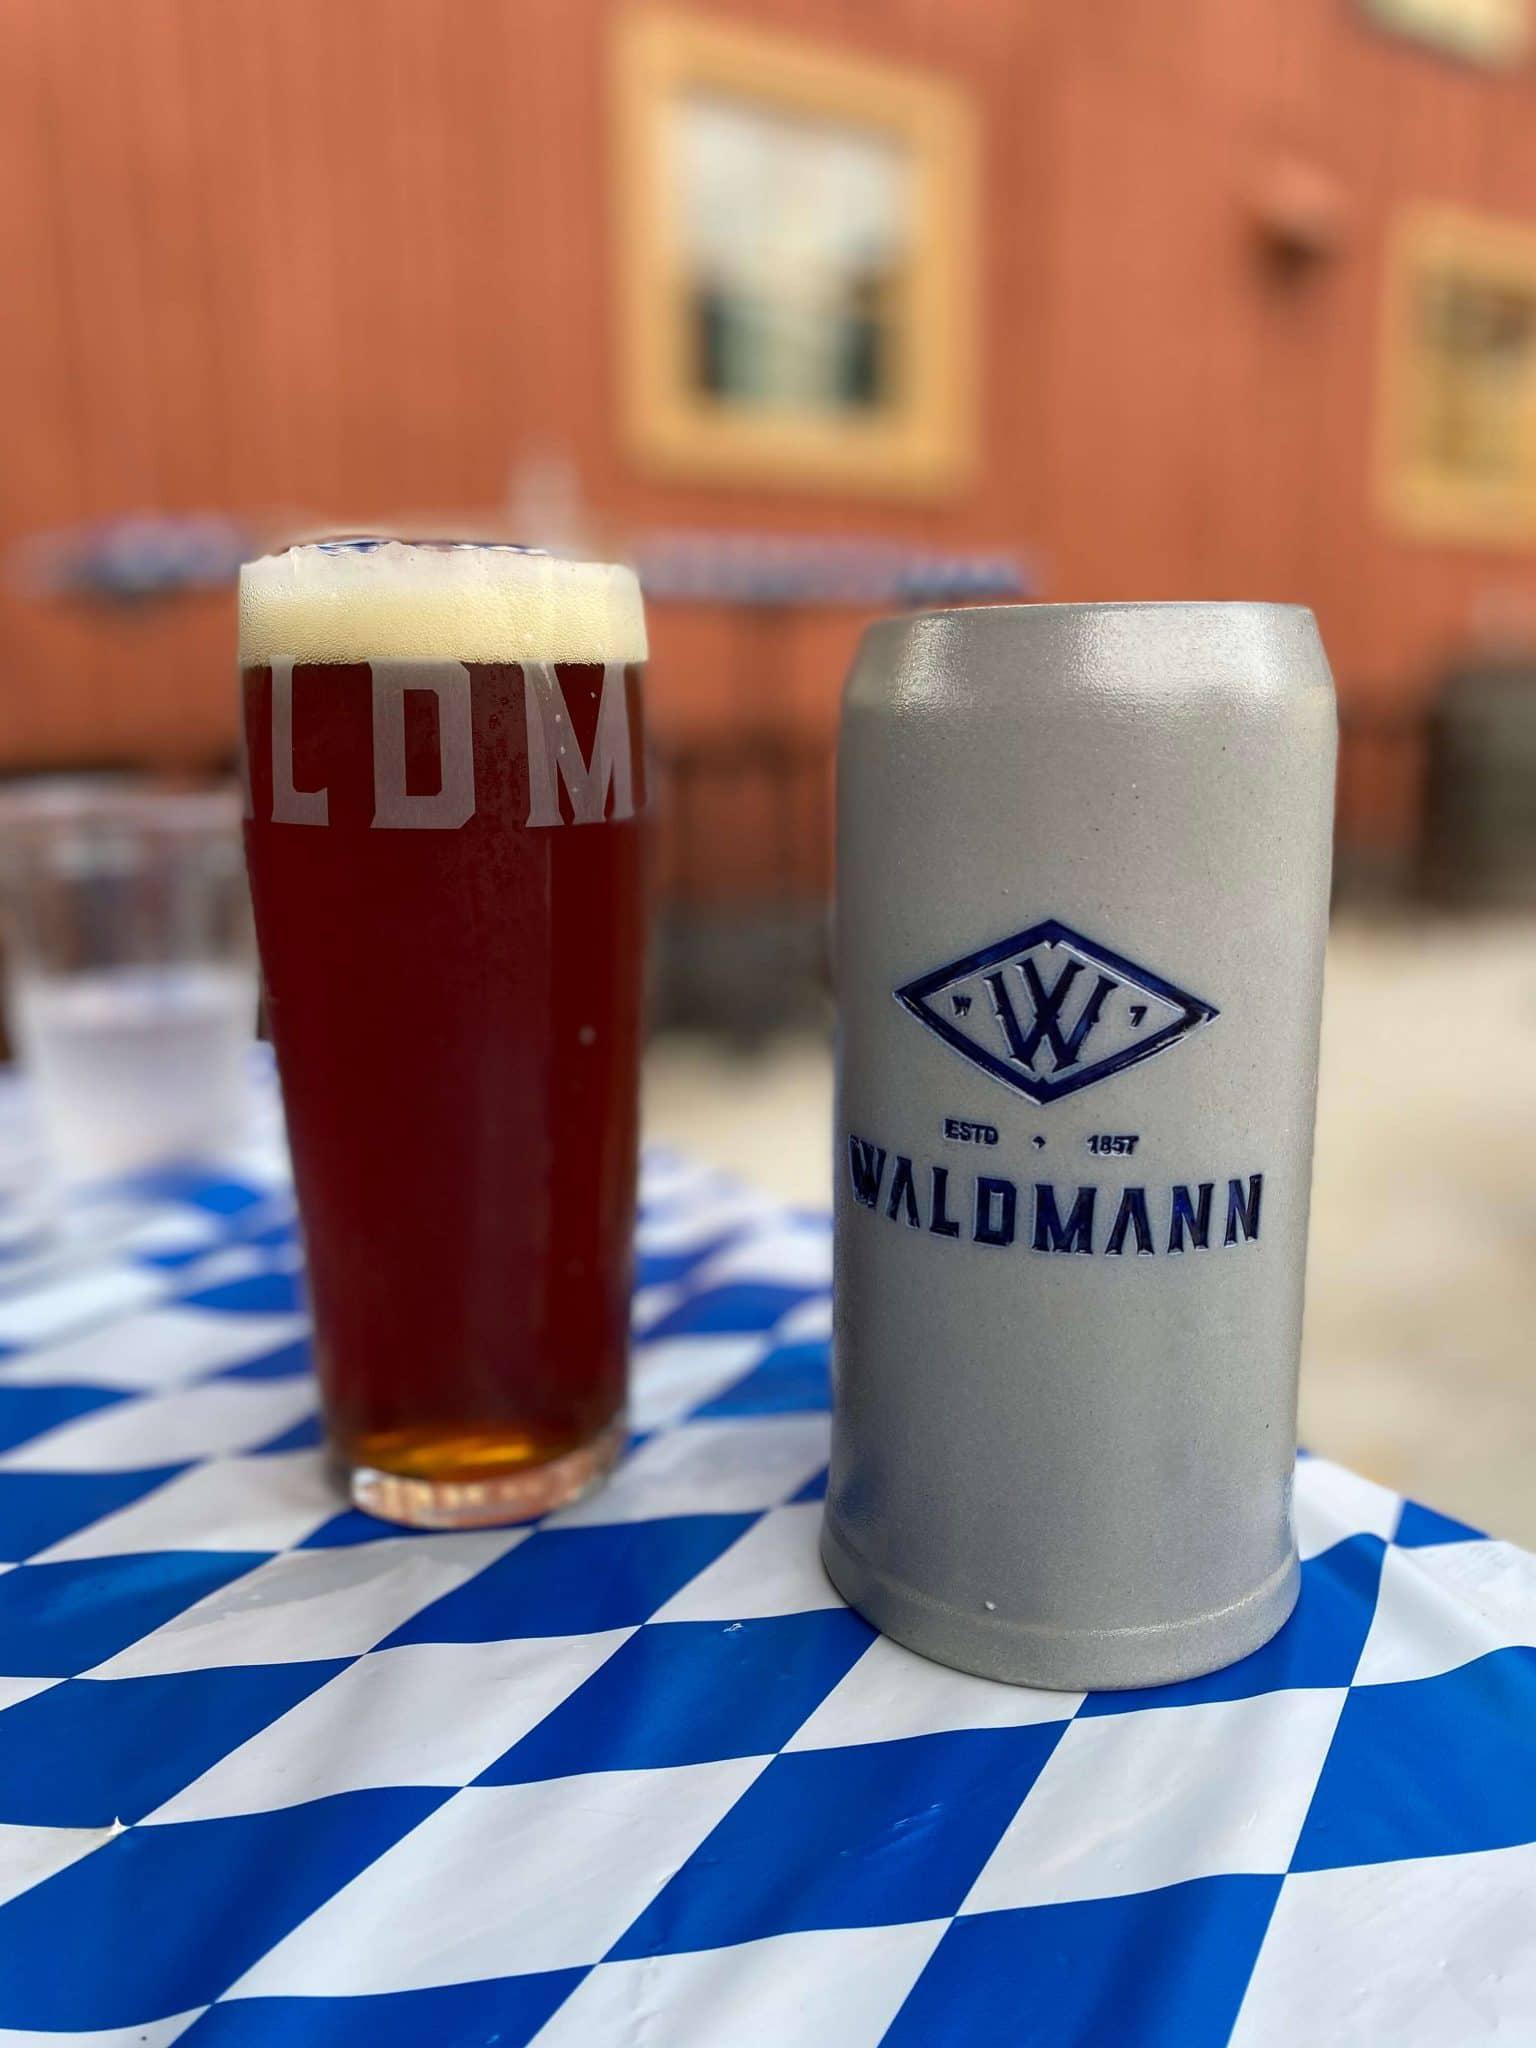 Waldmann Brewery - St. Paul, Minnesota